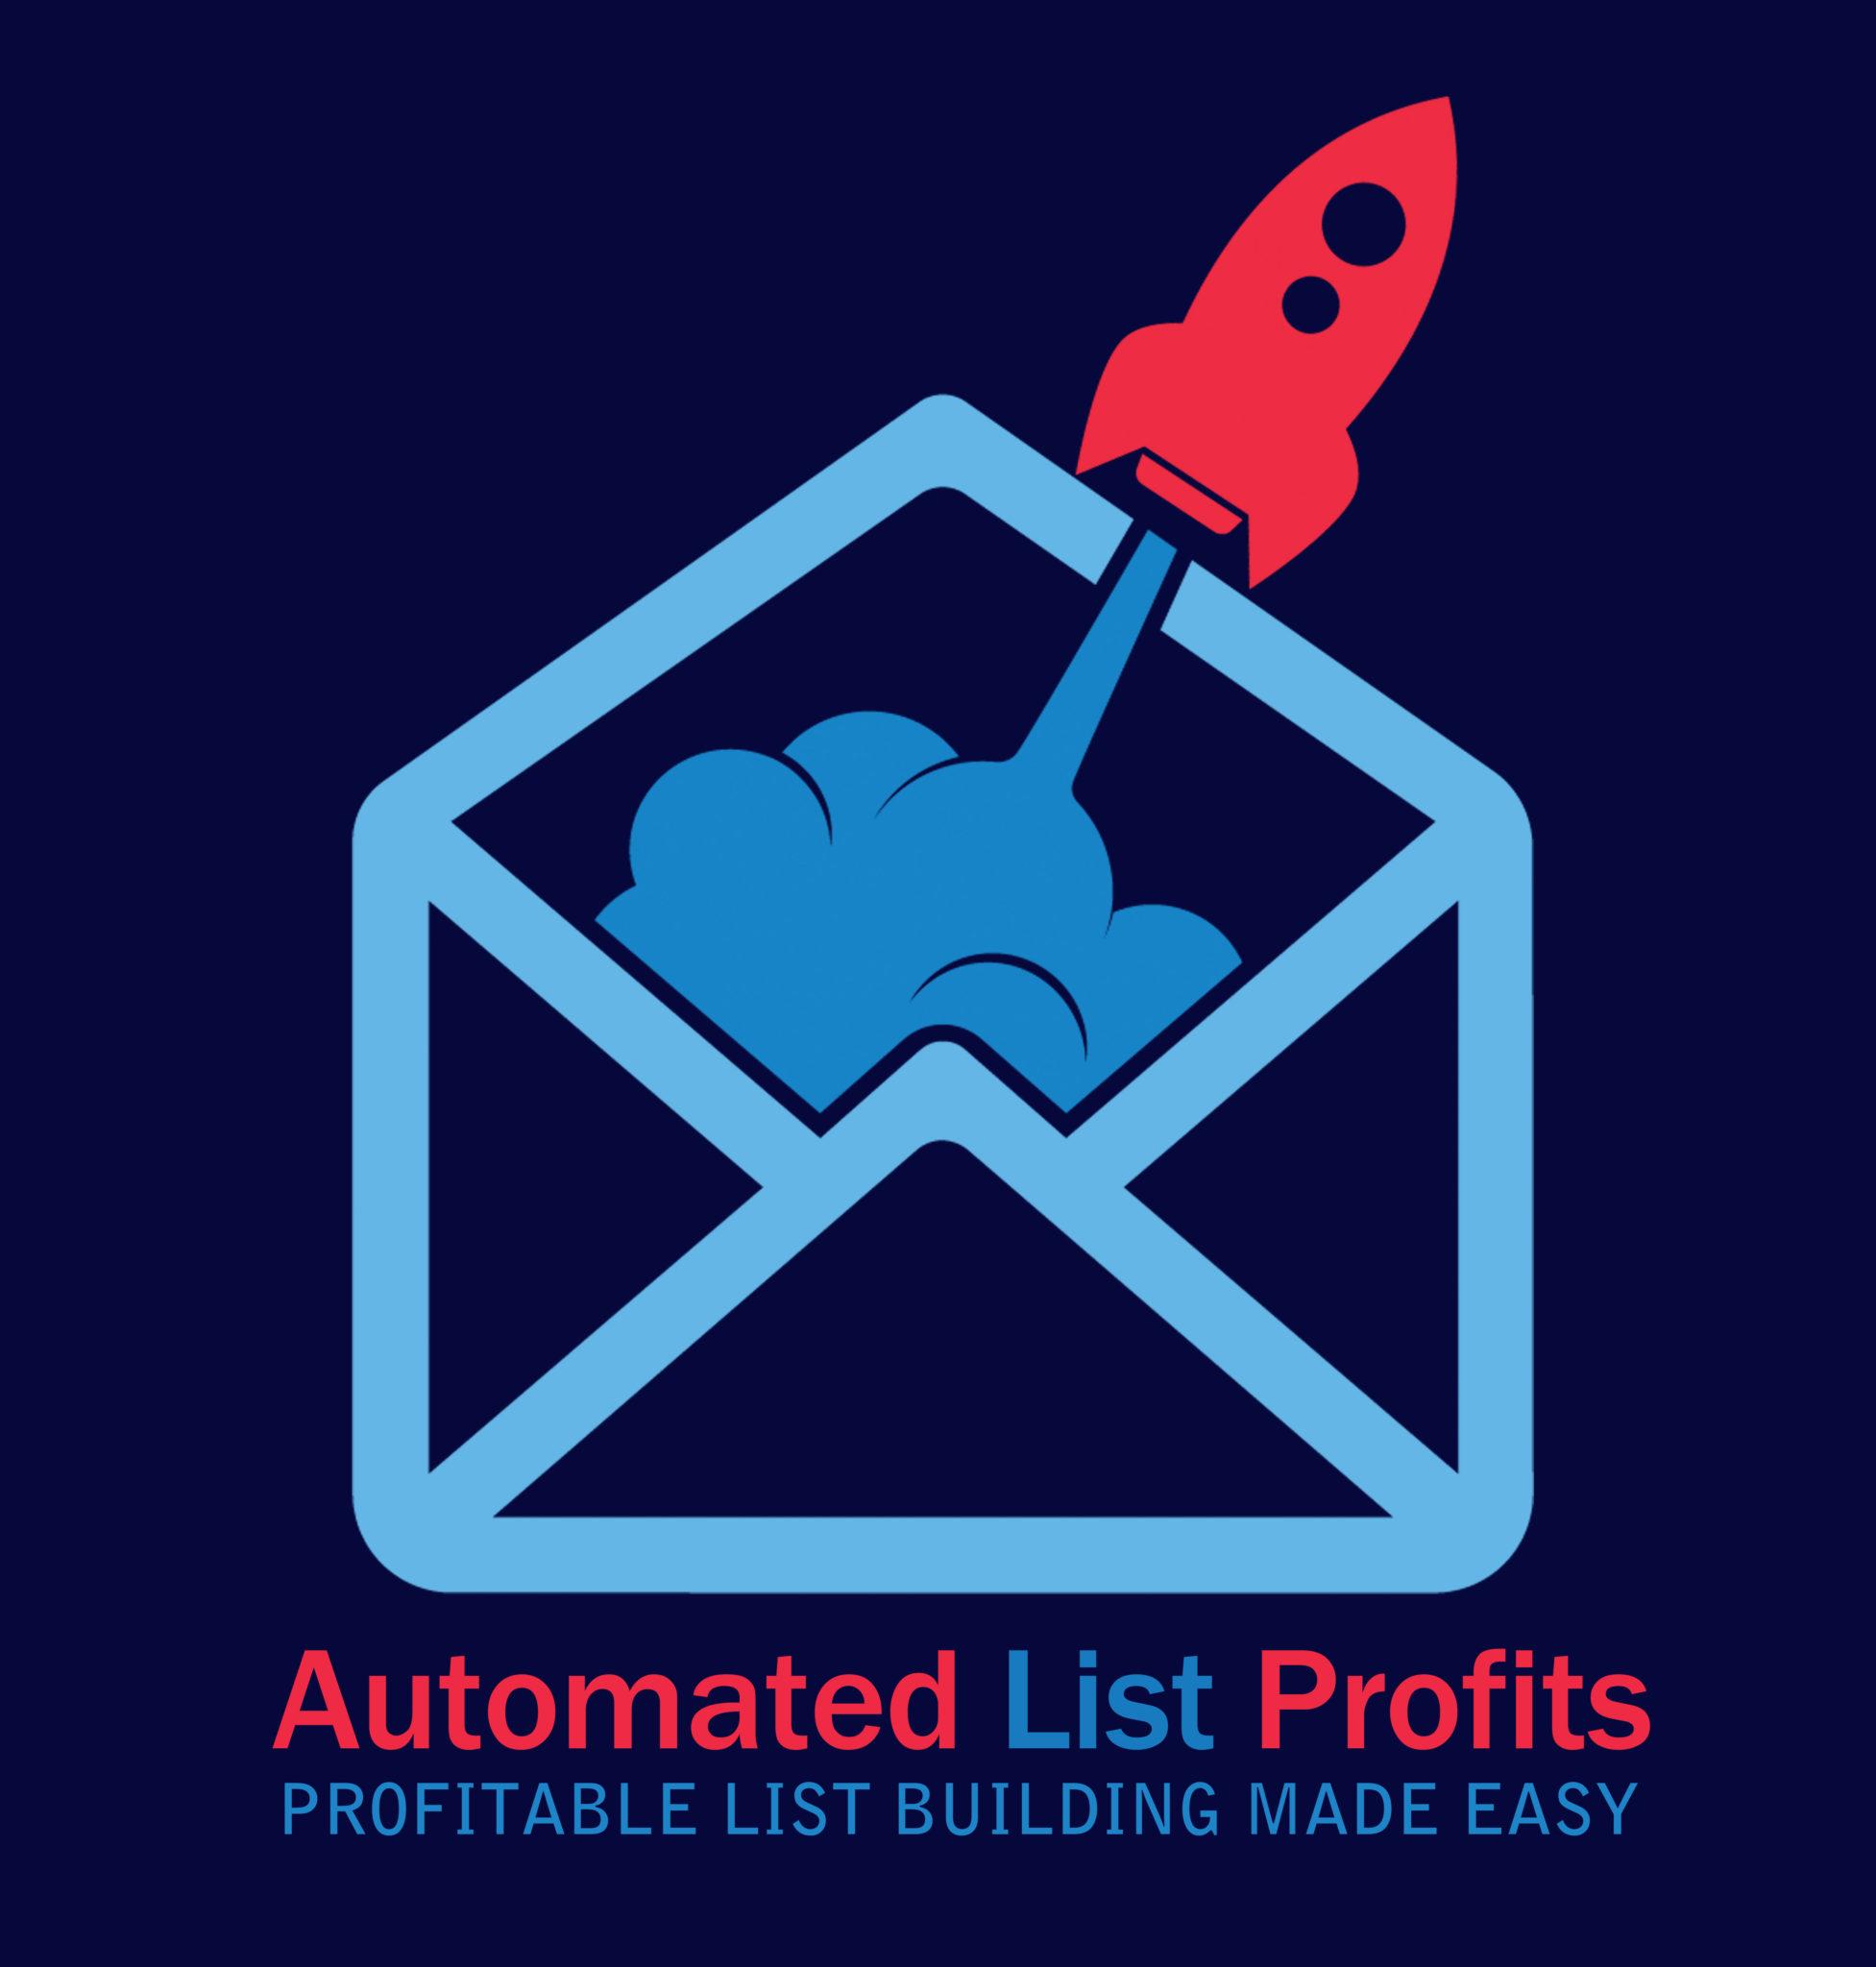 AutomatedListProfits-Login